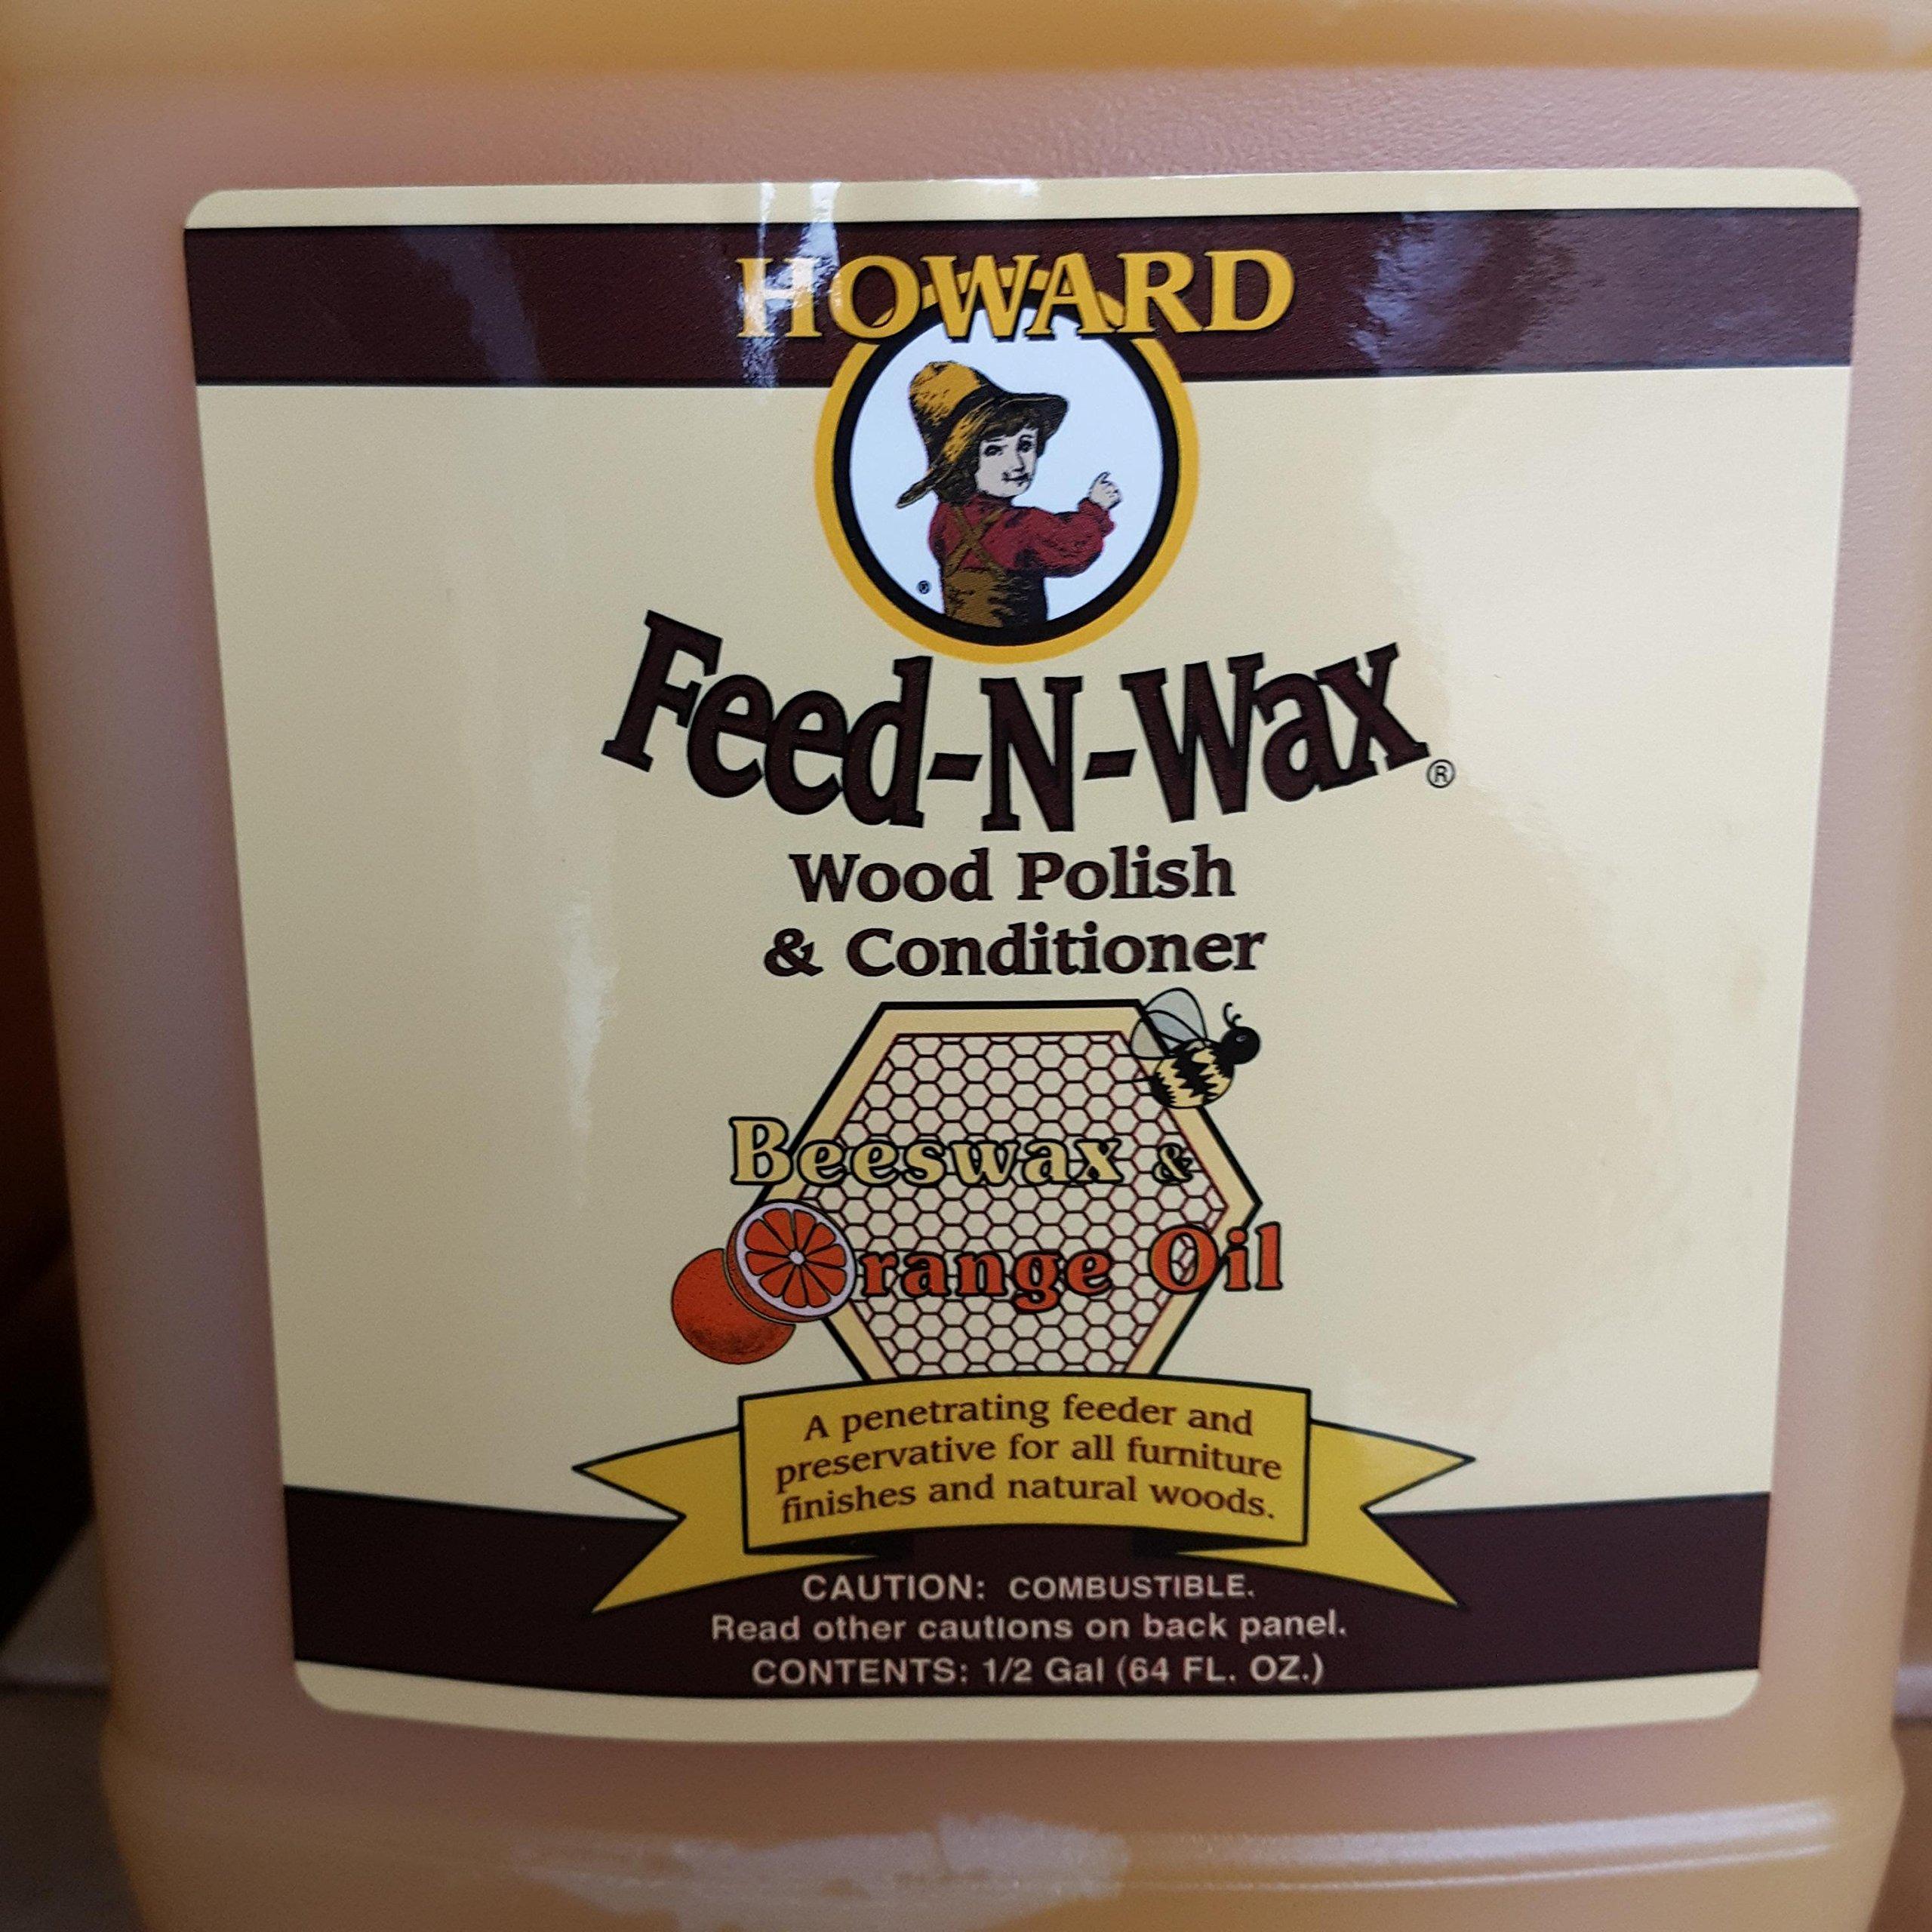 Howard Feed-N-Wax Restorative Wood Polish and Conditioner 64oz 1/2 Gallon, Polish Wood Floors, Antique Furniture Restoration, Wood Furniture by Howard Products (Image #9)